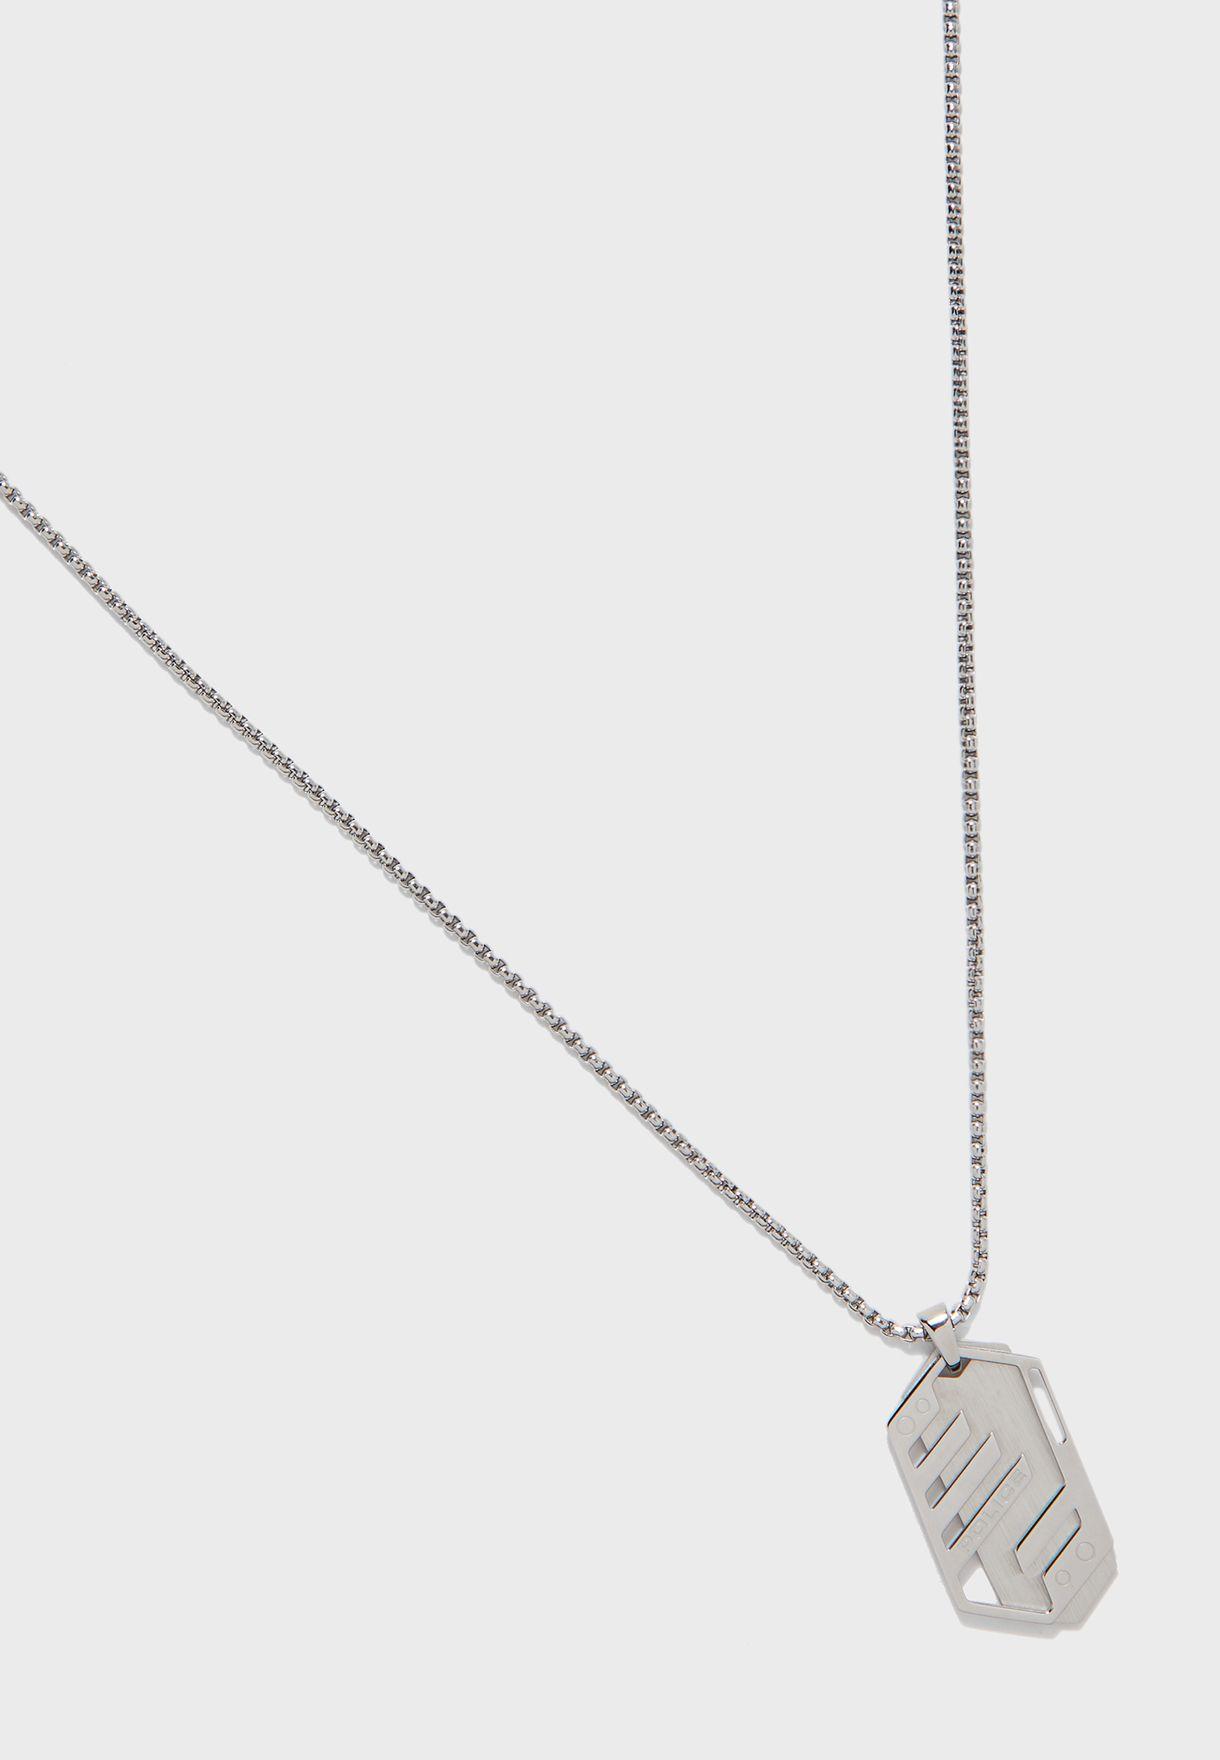 P PJ 26285PSS/01 Necklace